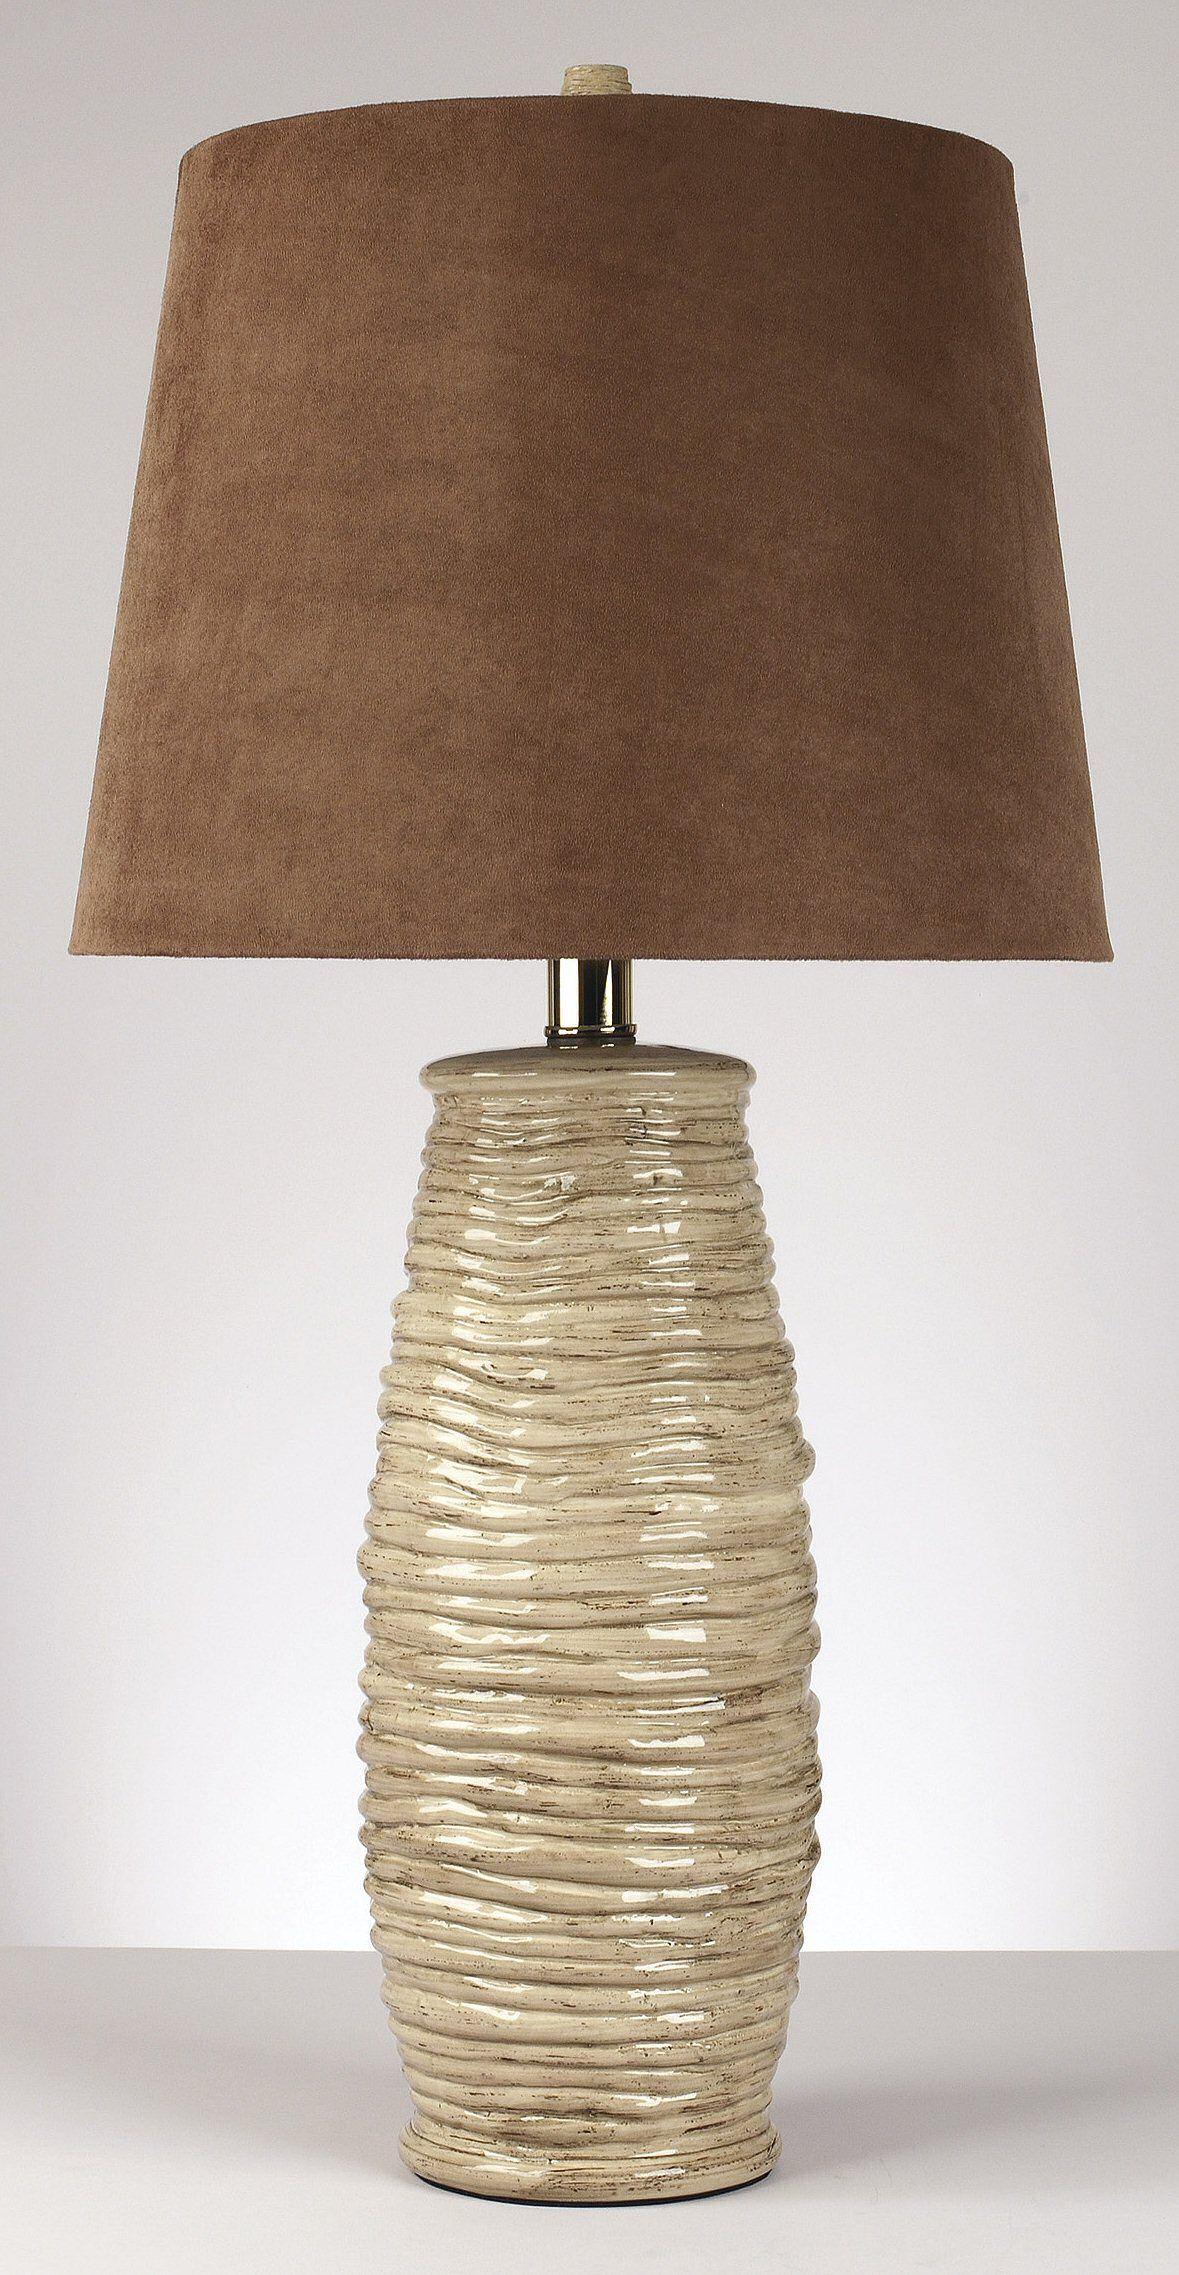 0 000498 30 H Haldis Set Of 2 Table Lamps Textured Beige Ceramic